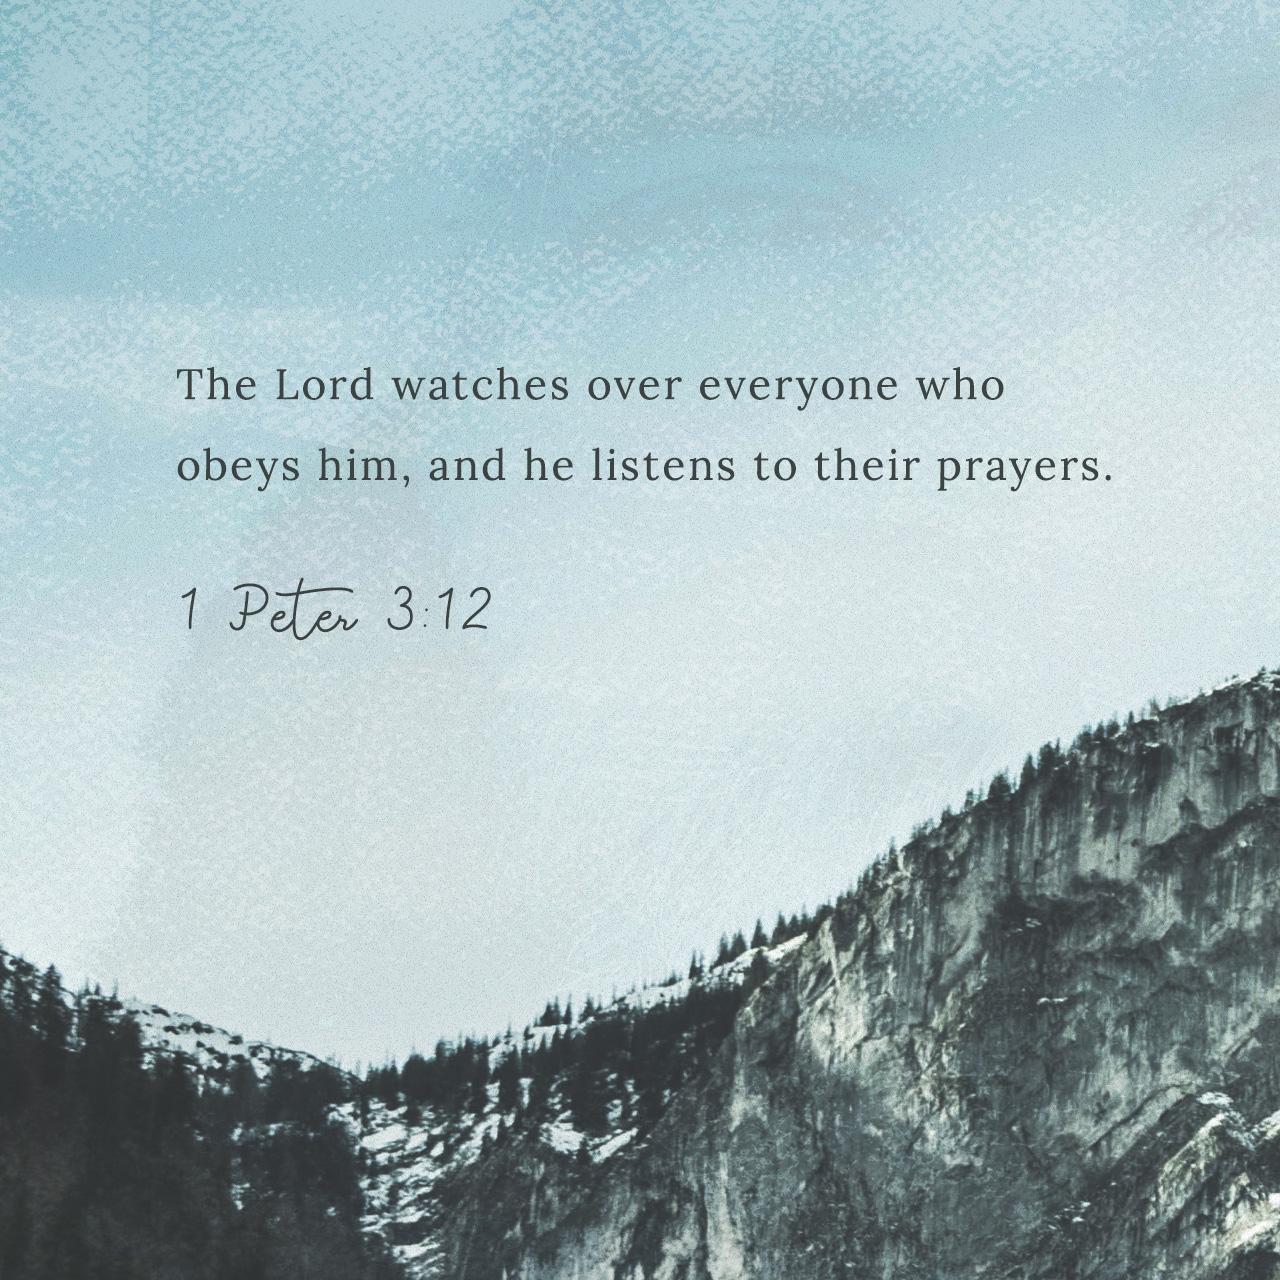 1 Peter 3:12